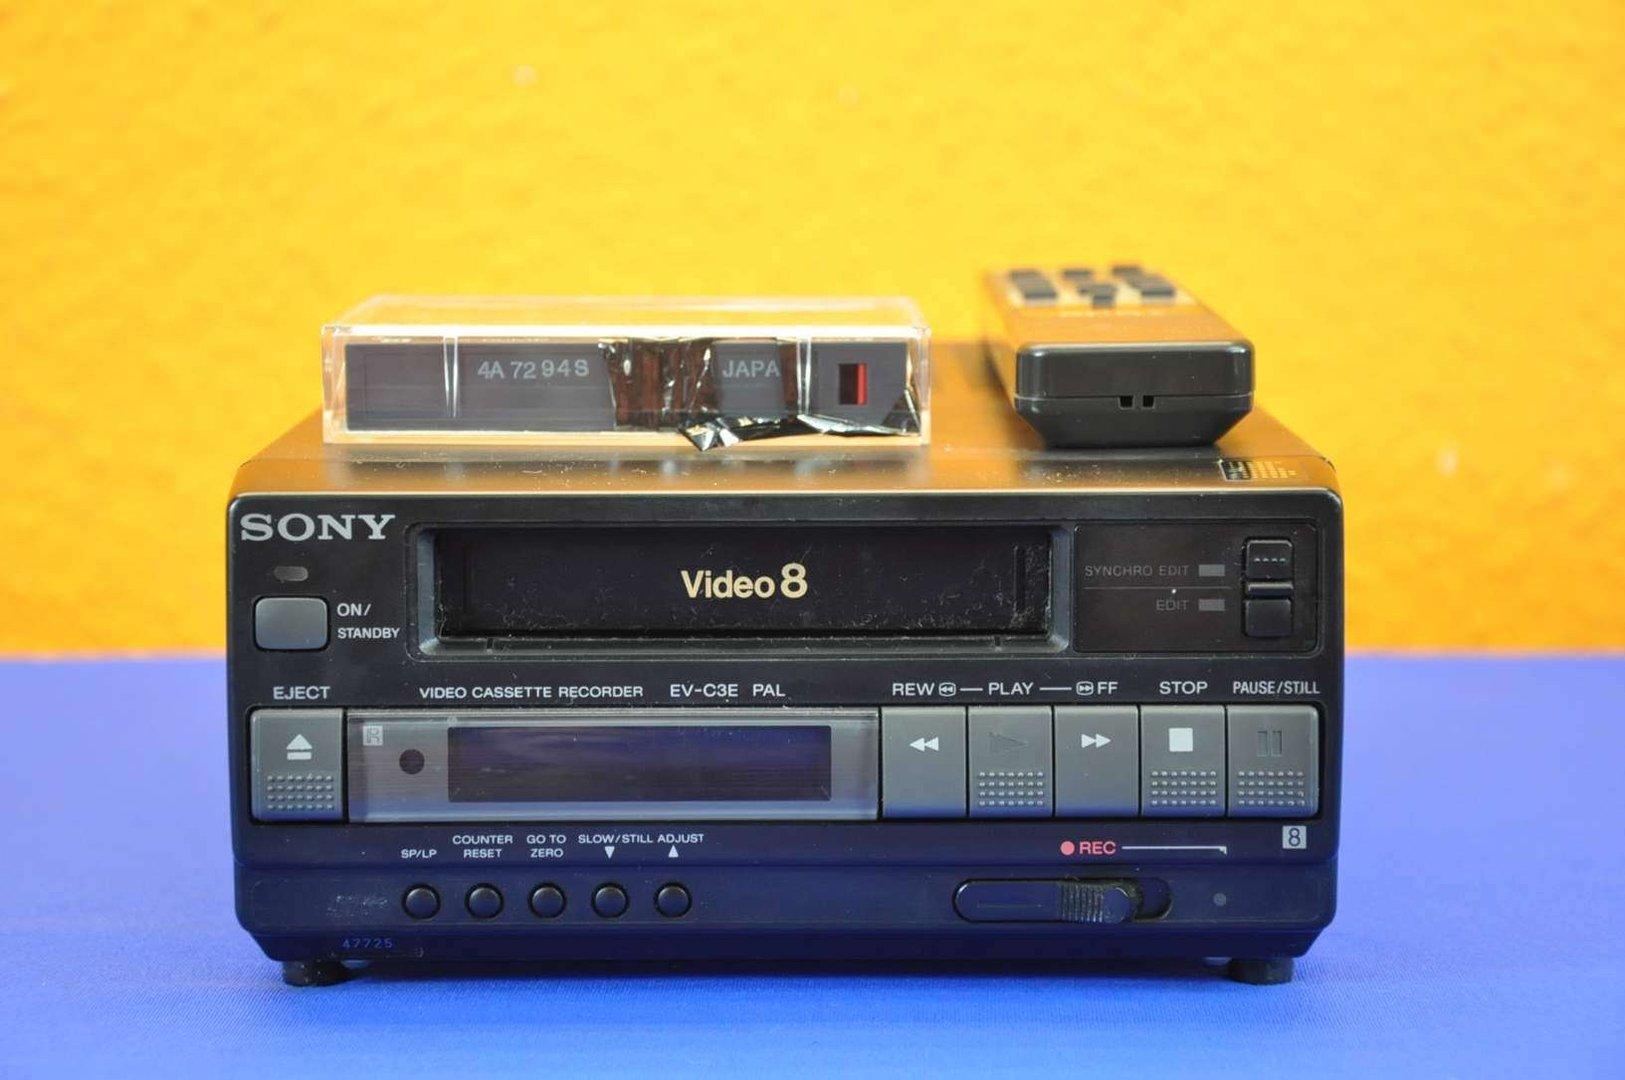 Sony Video 8 Video Cassetten Recorder EV-C3E PAL